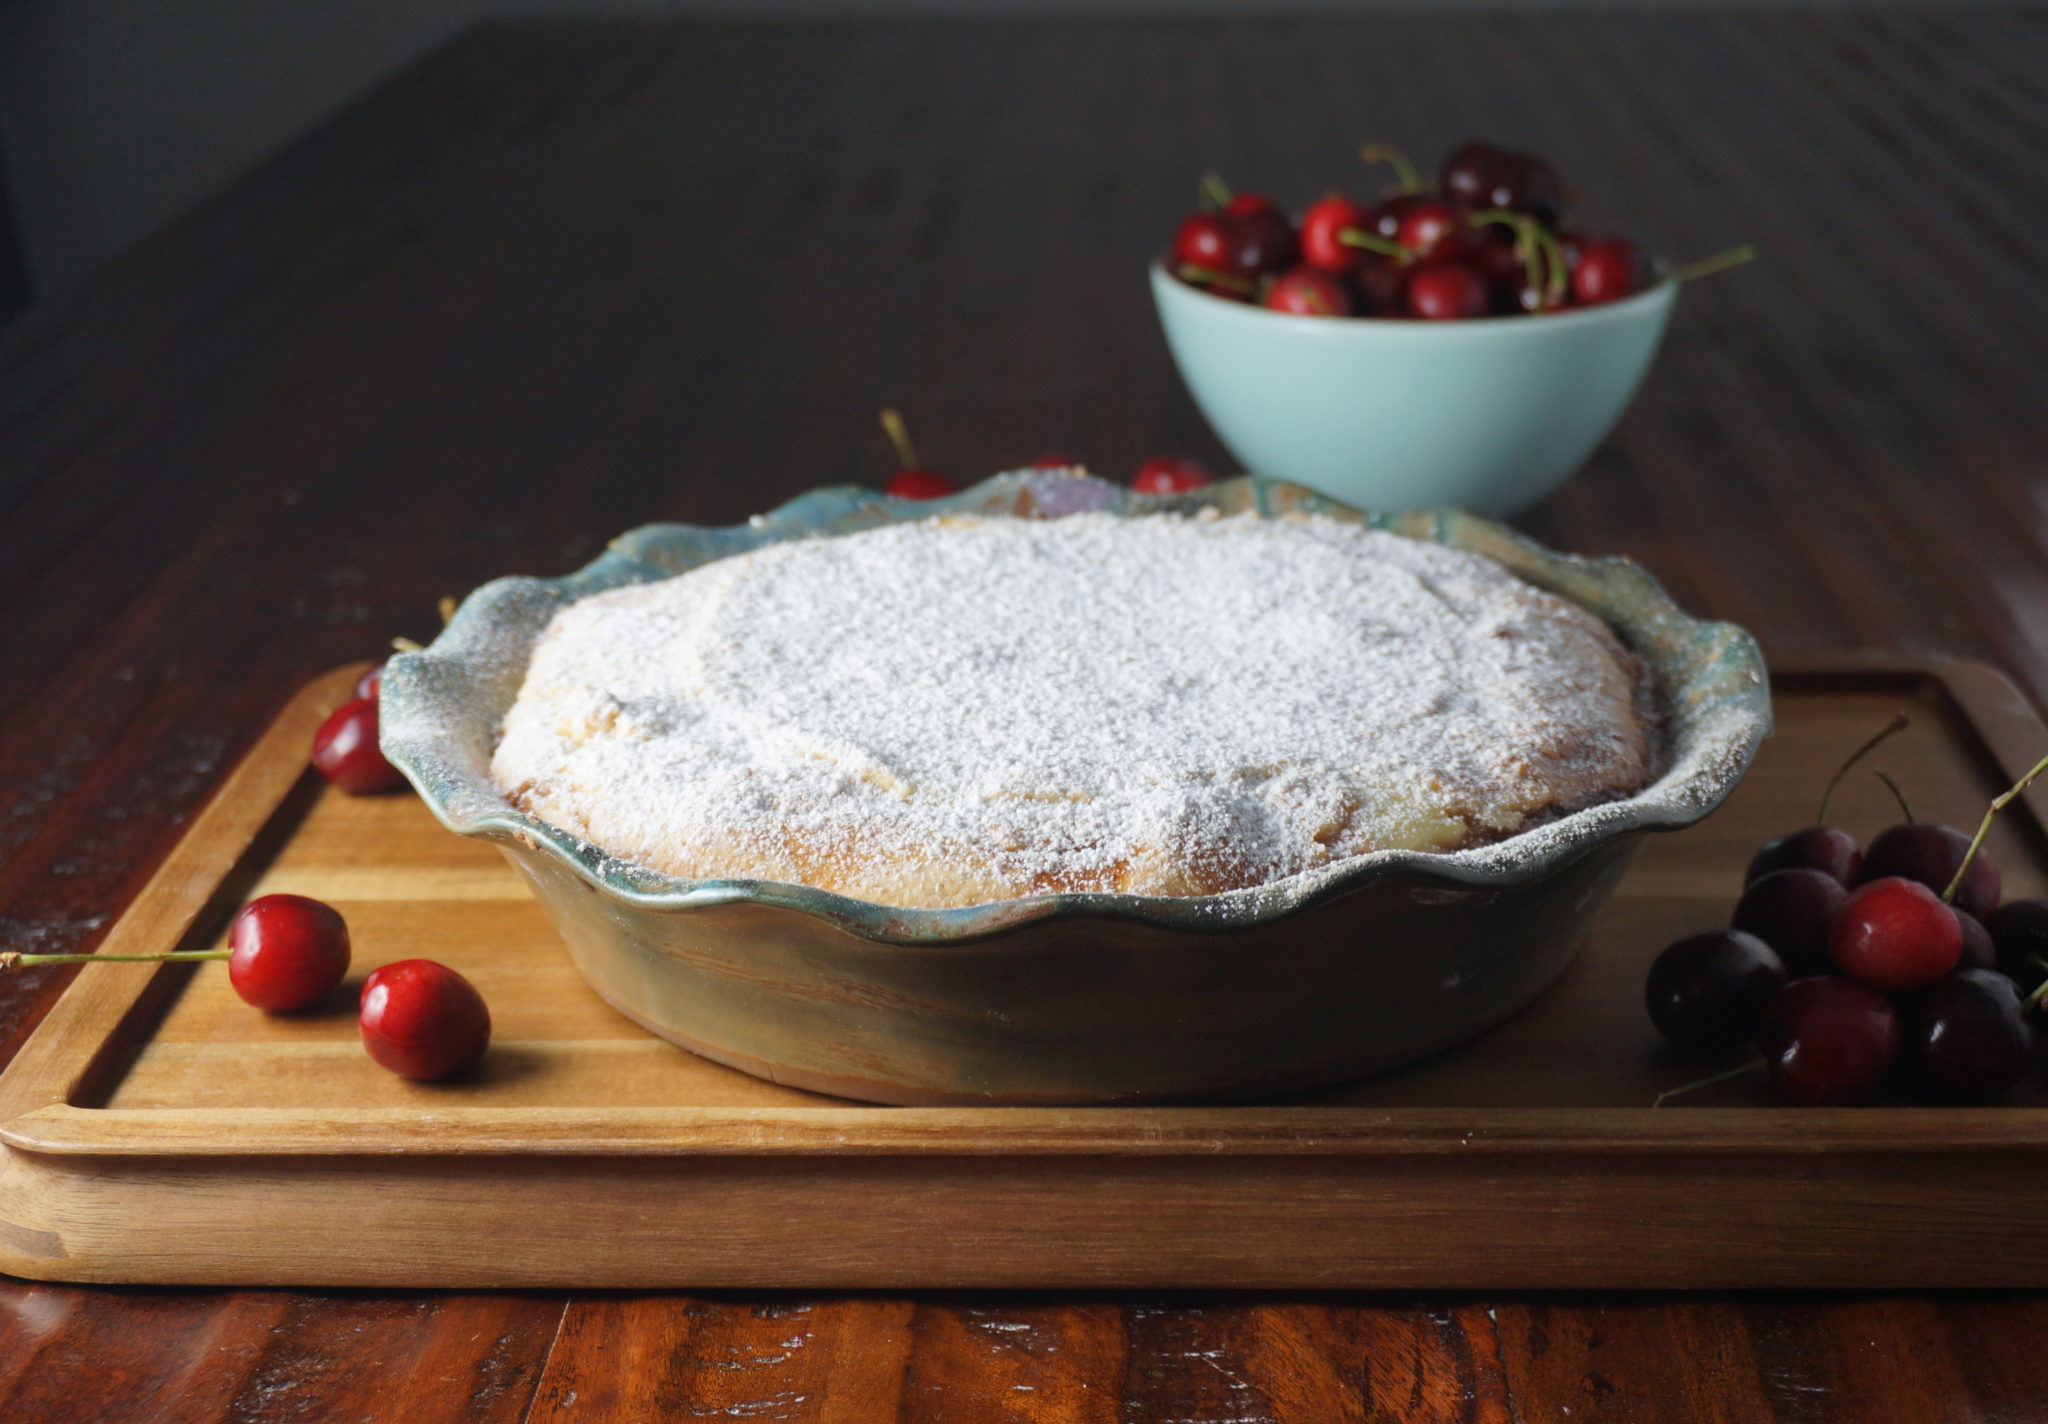 Crostata ricotta e visciole (Roman Jewish Cherry Cheesecake)